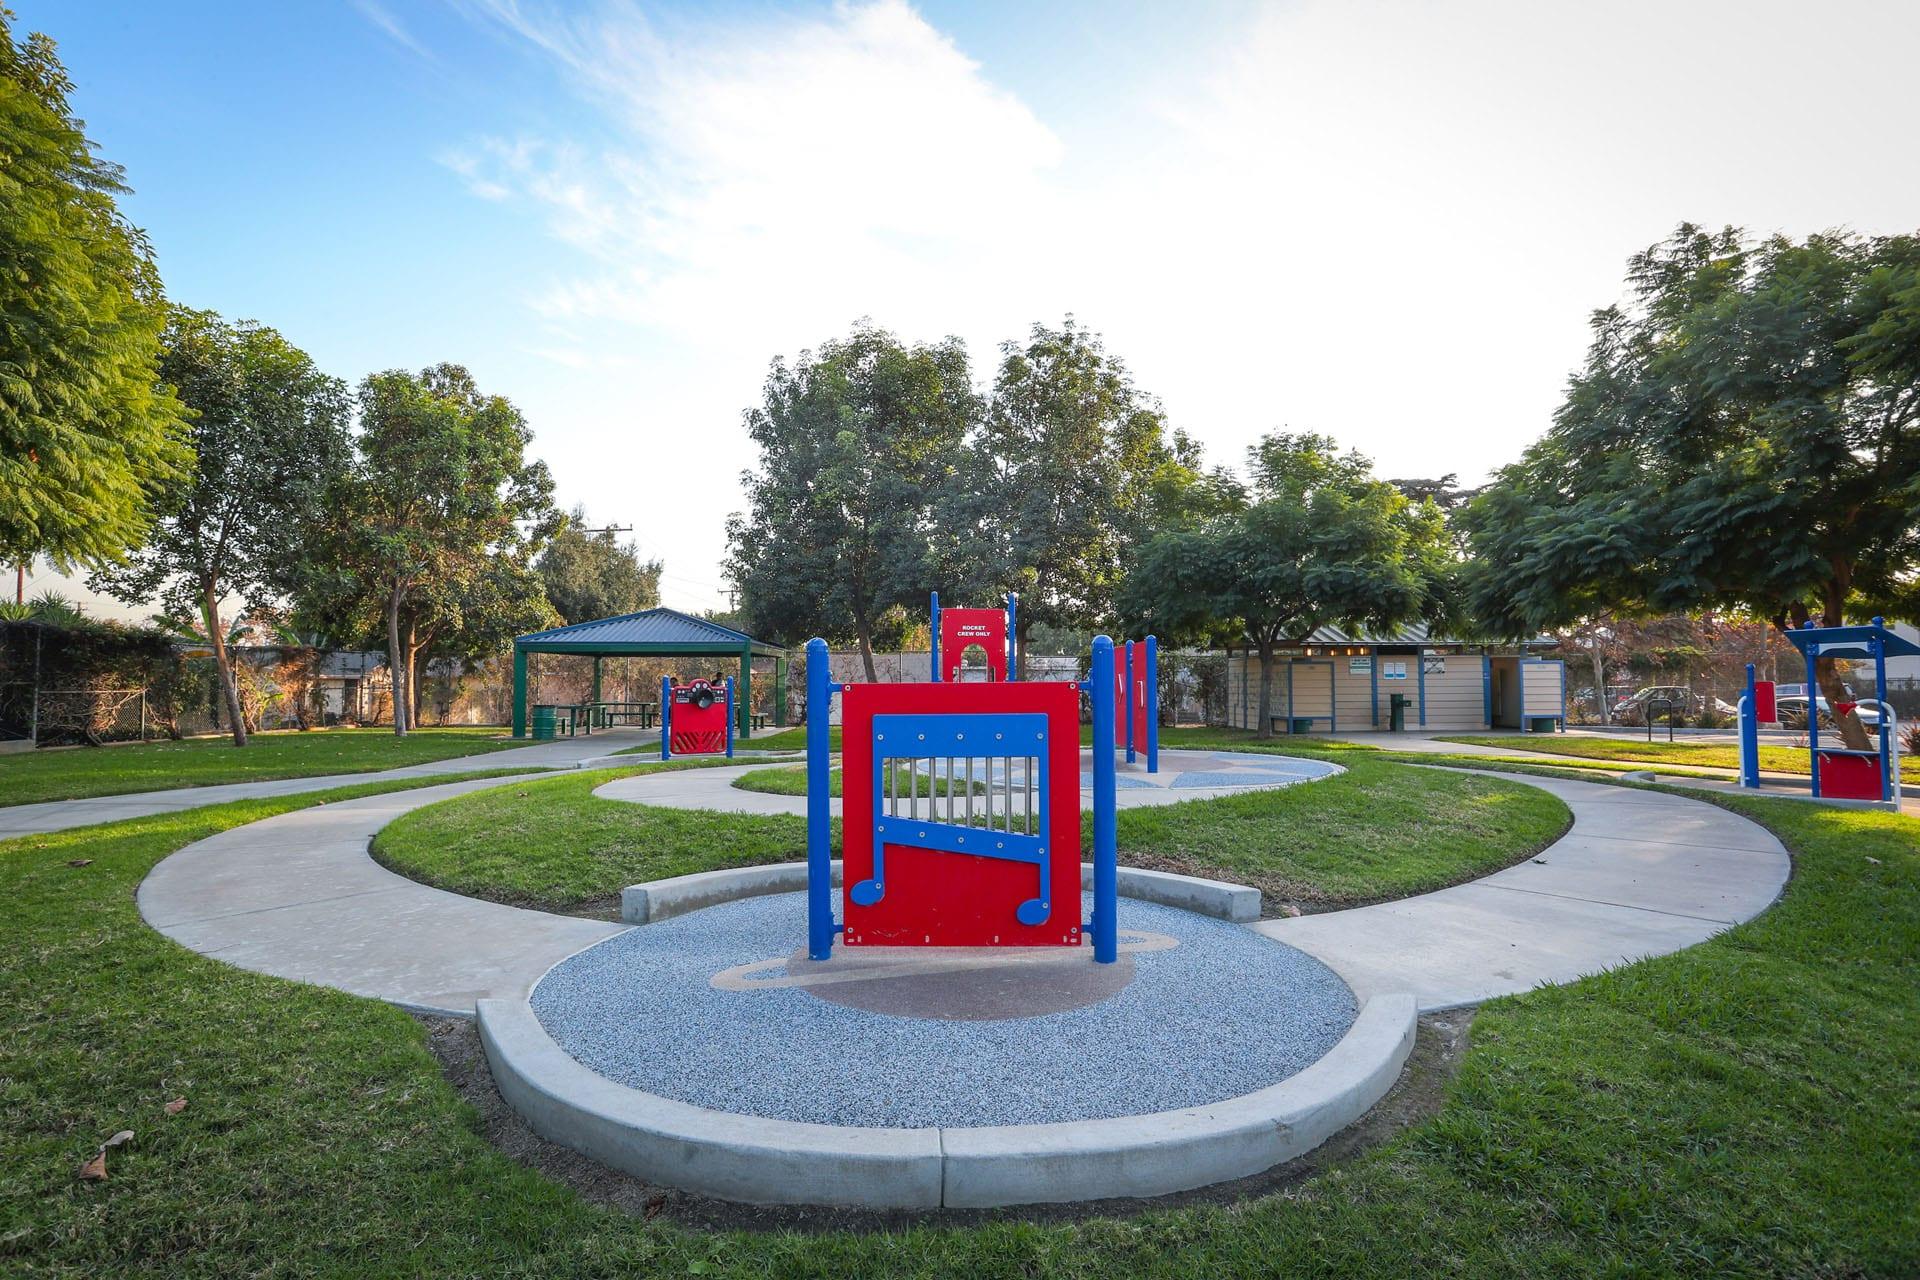 Paths running through a musical playground